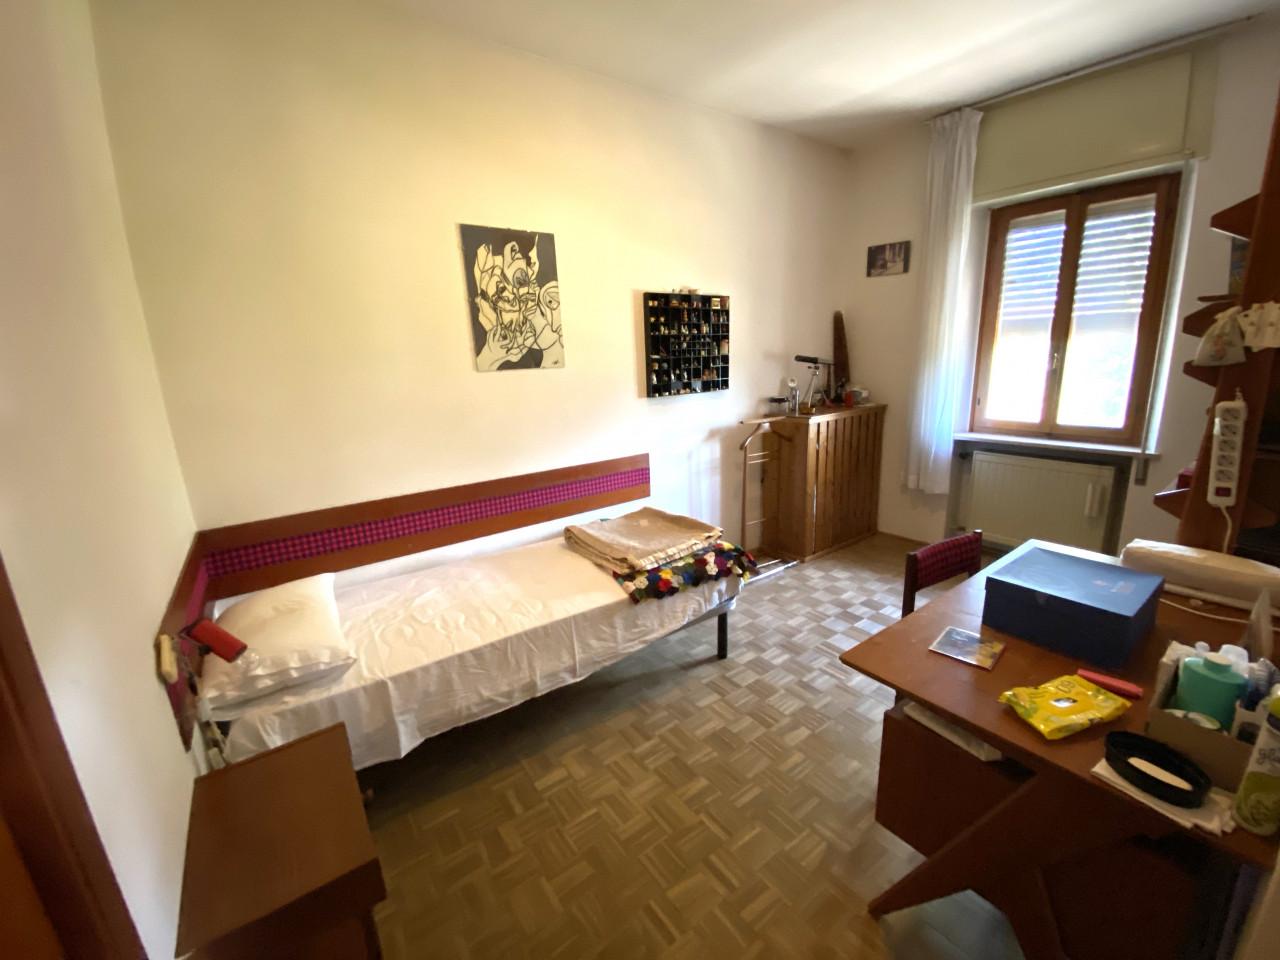 Casa singola con capannone in vendita in centro a Budoia - Rif. V.D.1 https://images.gestionaleimmobiliare.it/foto/annunci/200702/2265893/1280x1280/010__img_2984.jpg